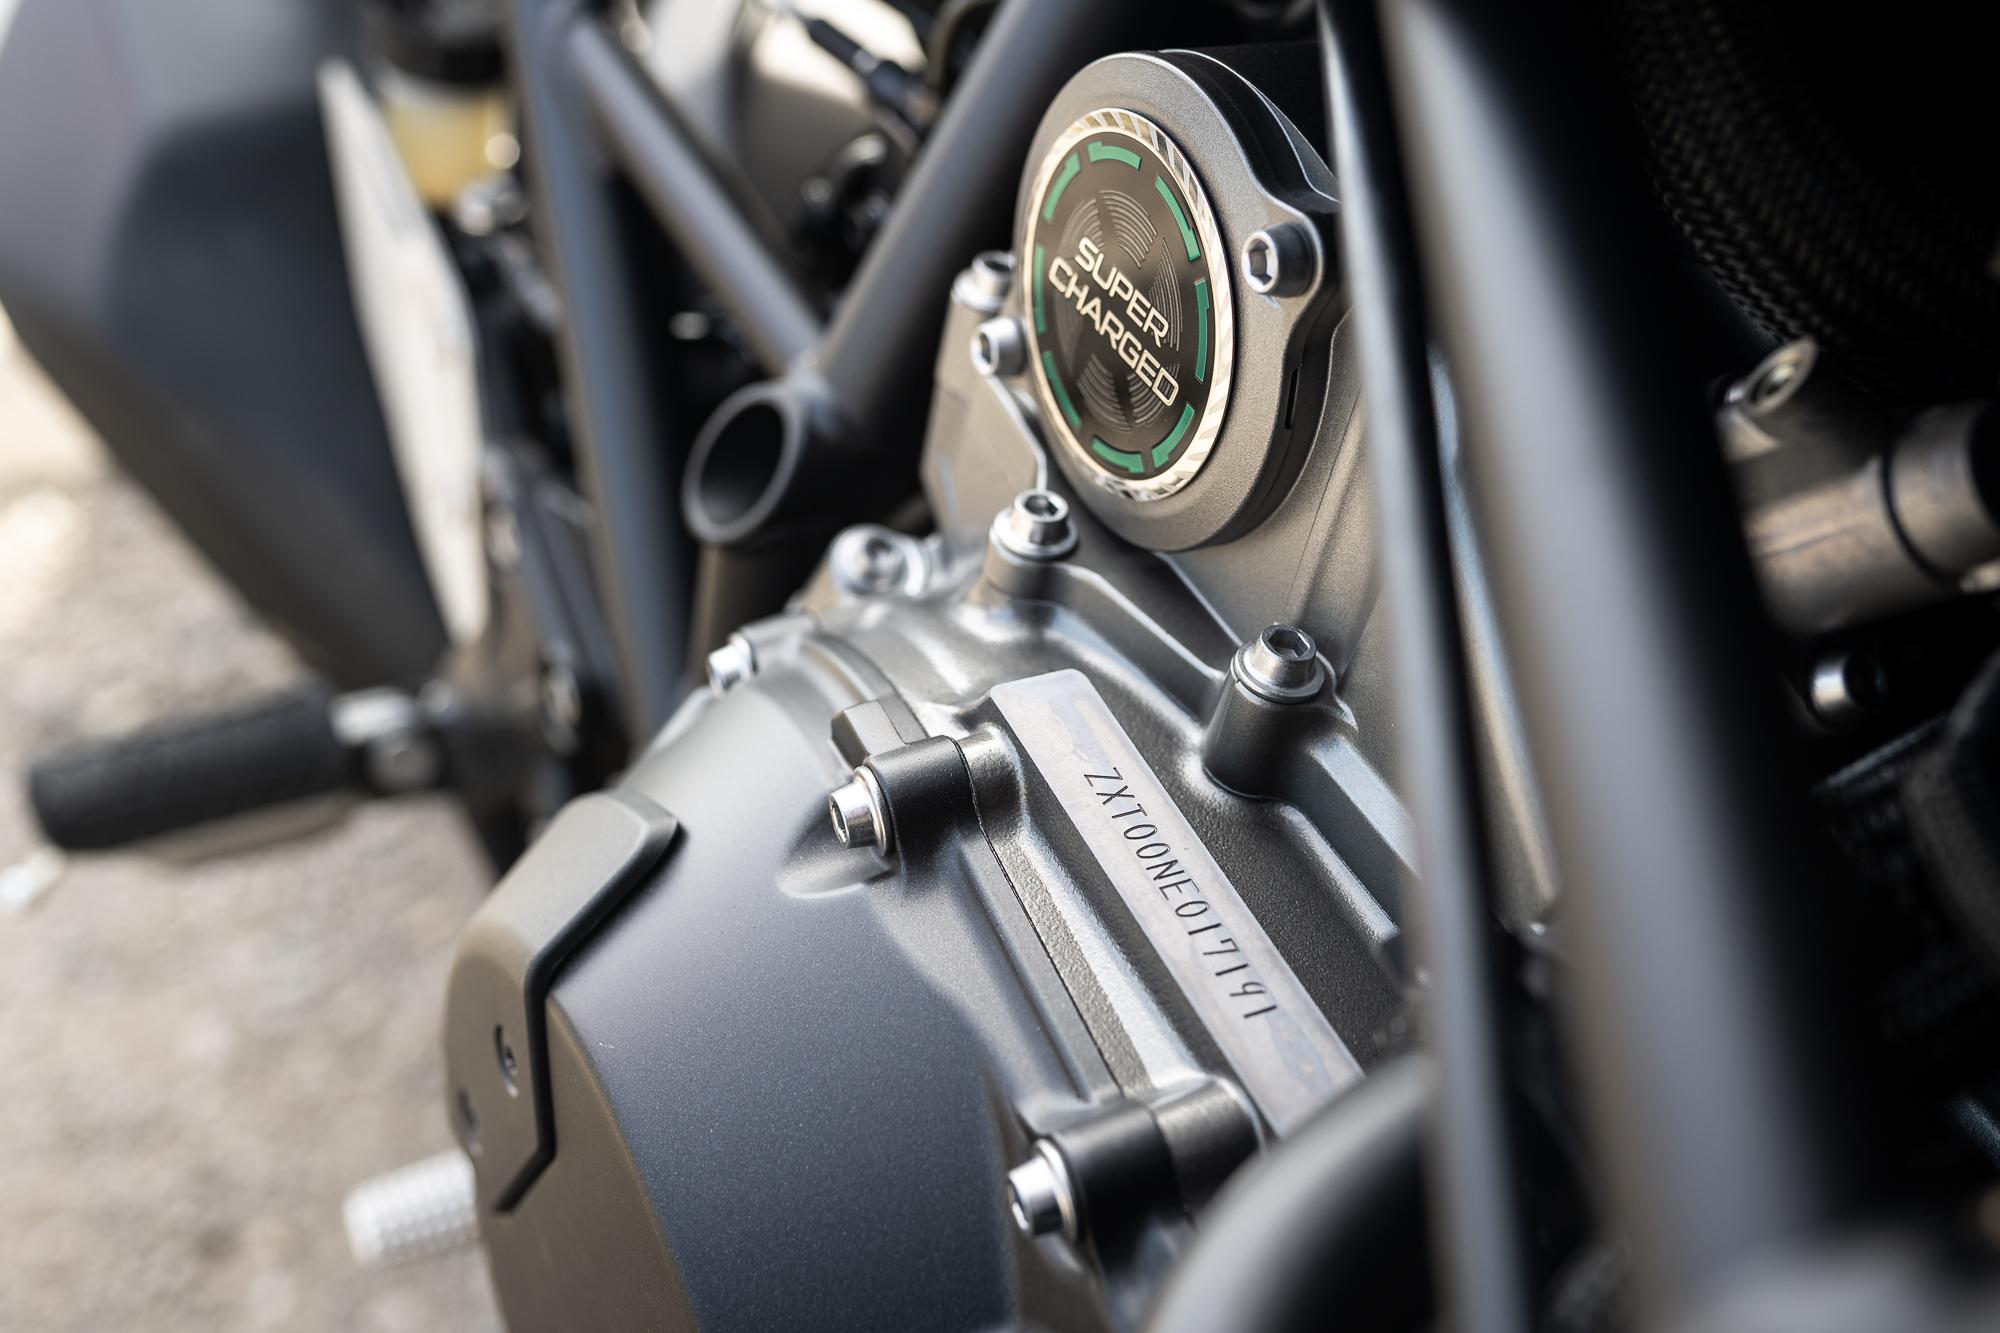 2021 Kawasaki H2 SX-SE super charged detail